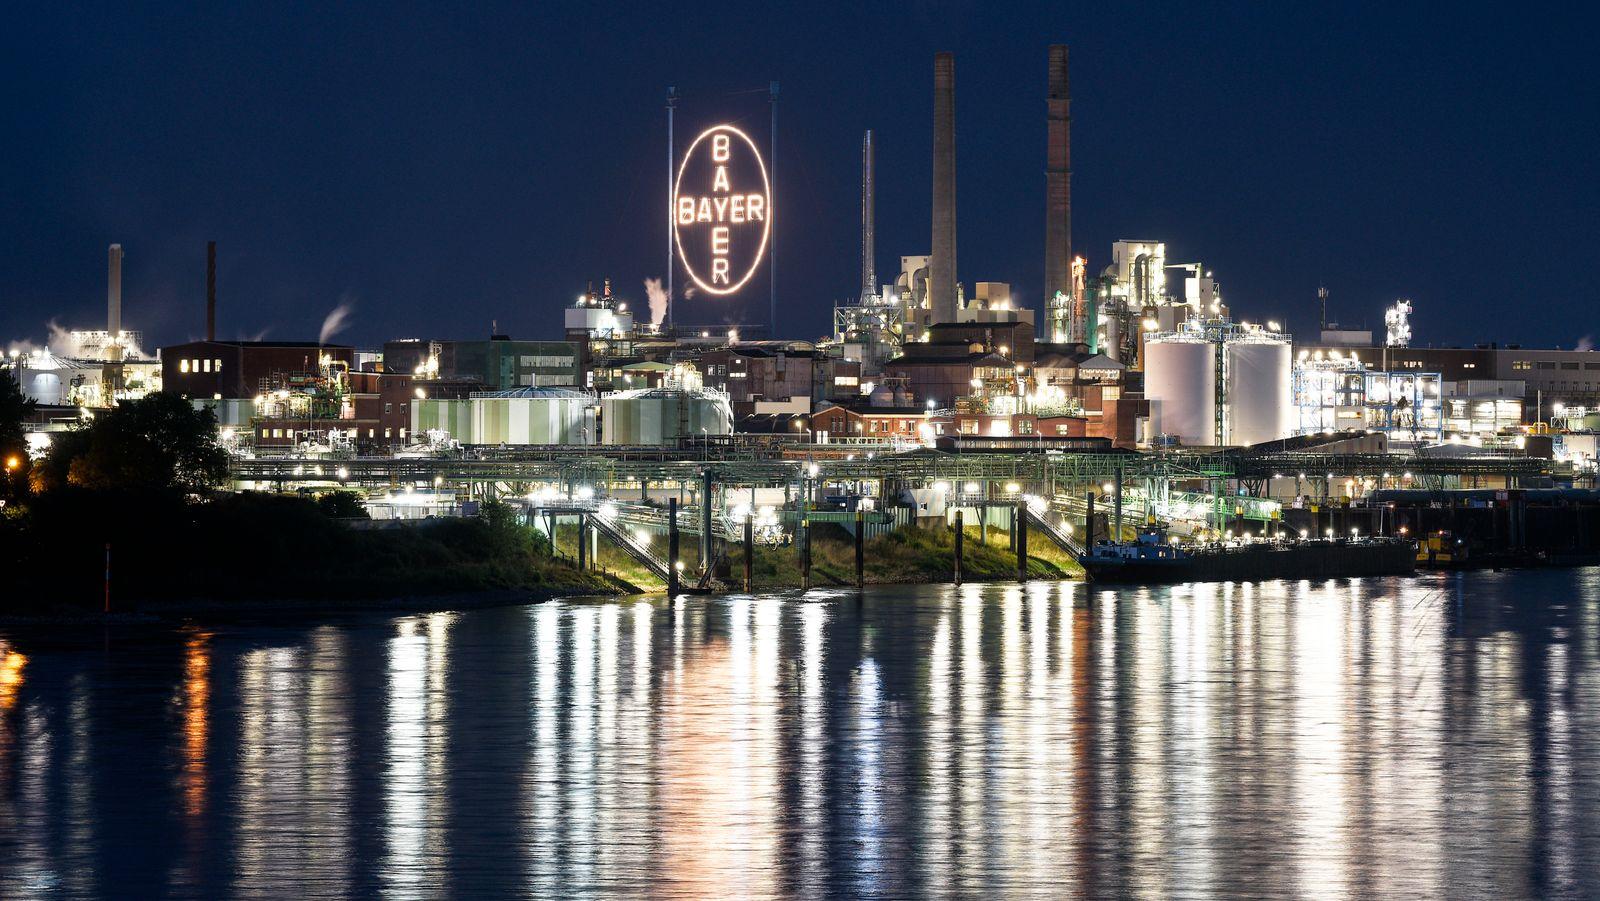 Germany Bayer